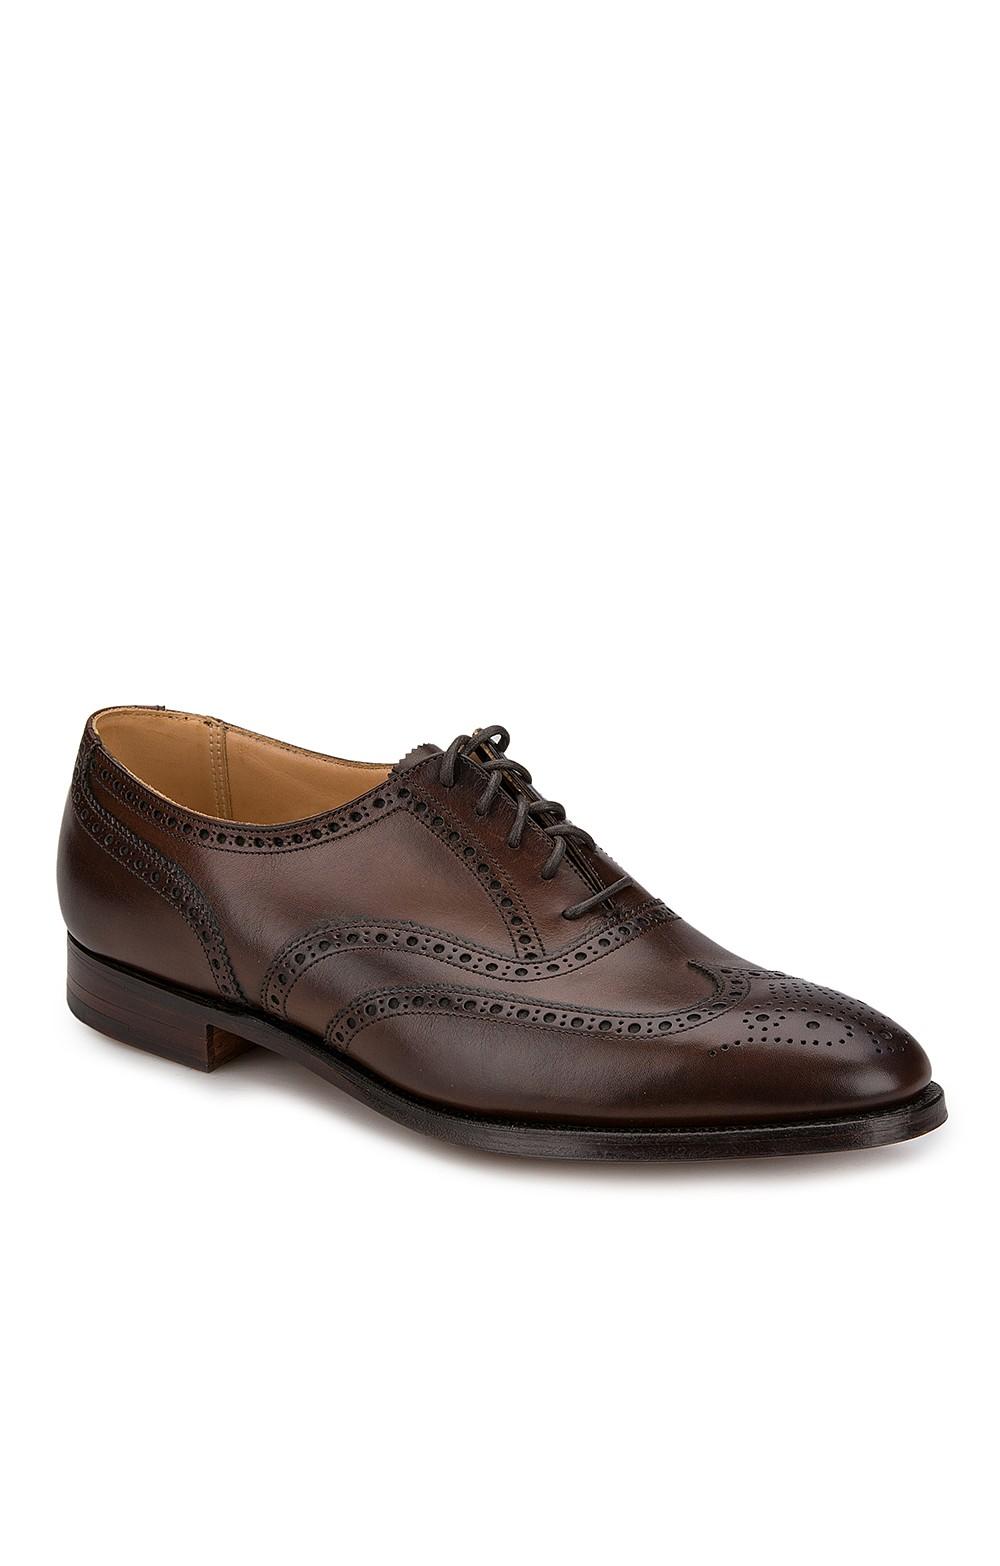 cee8eb1c973 Mens Crockett And Jones Finsbury Shoe